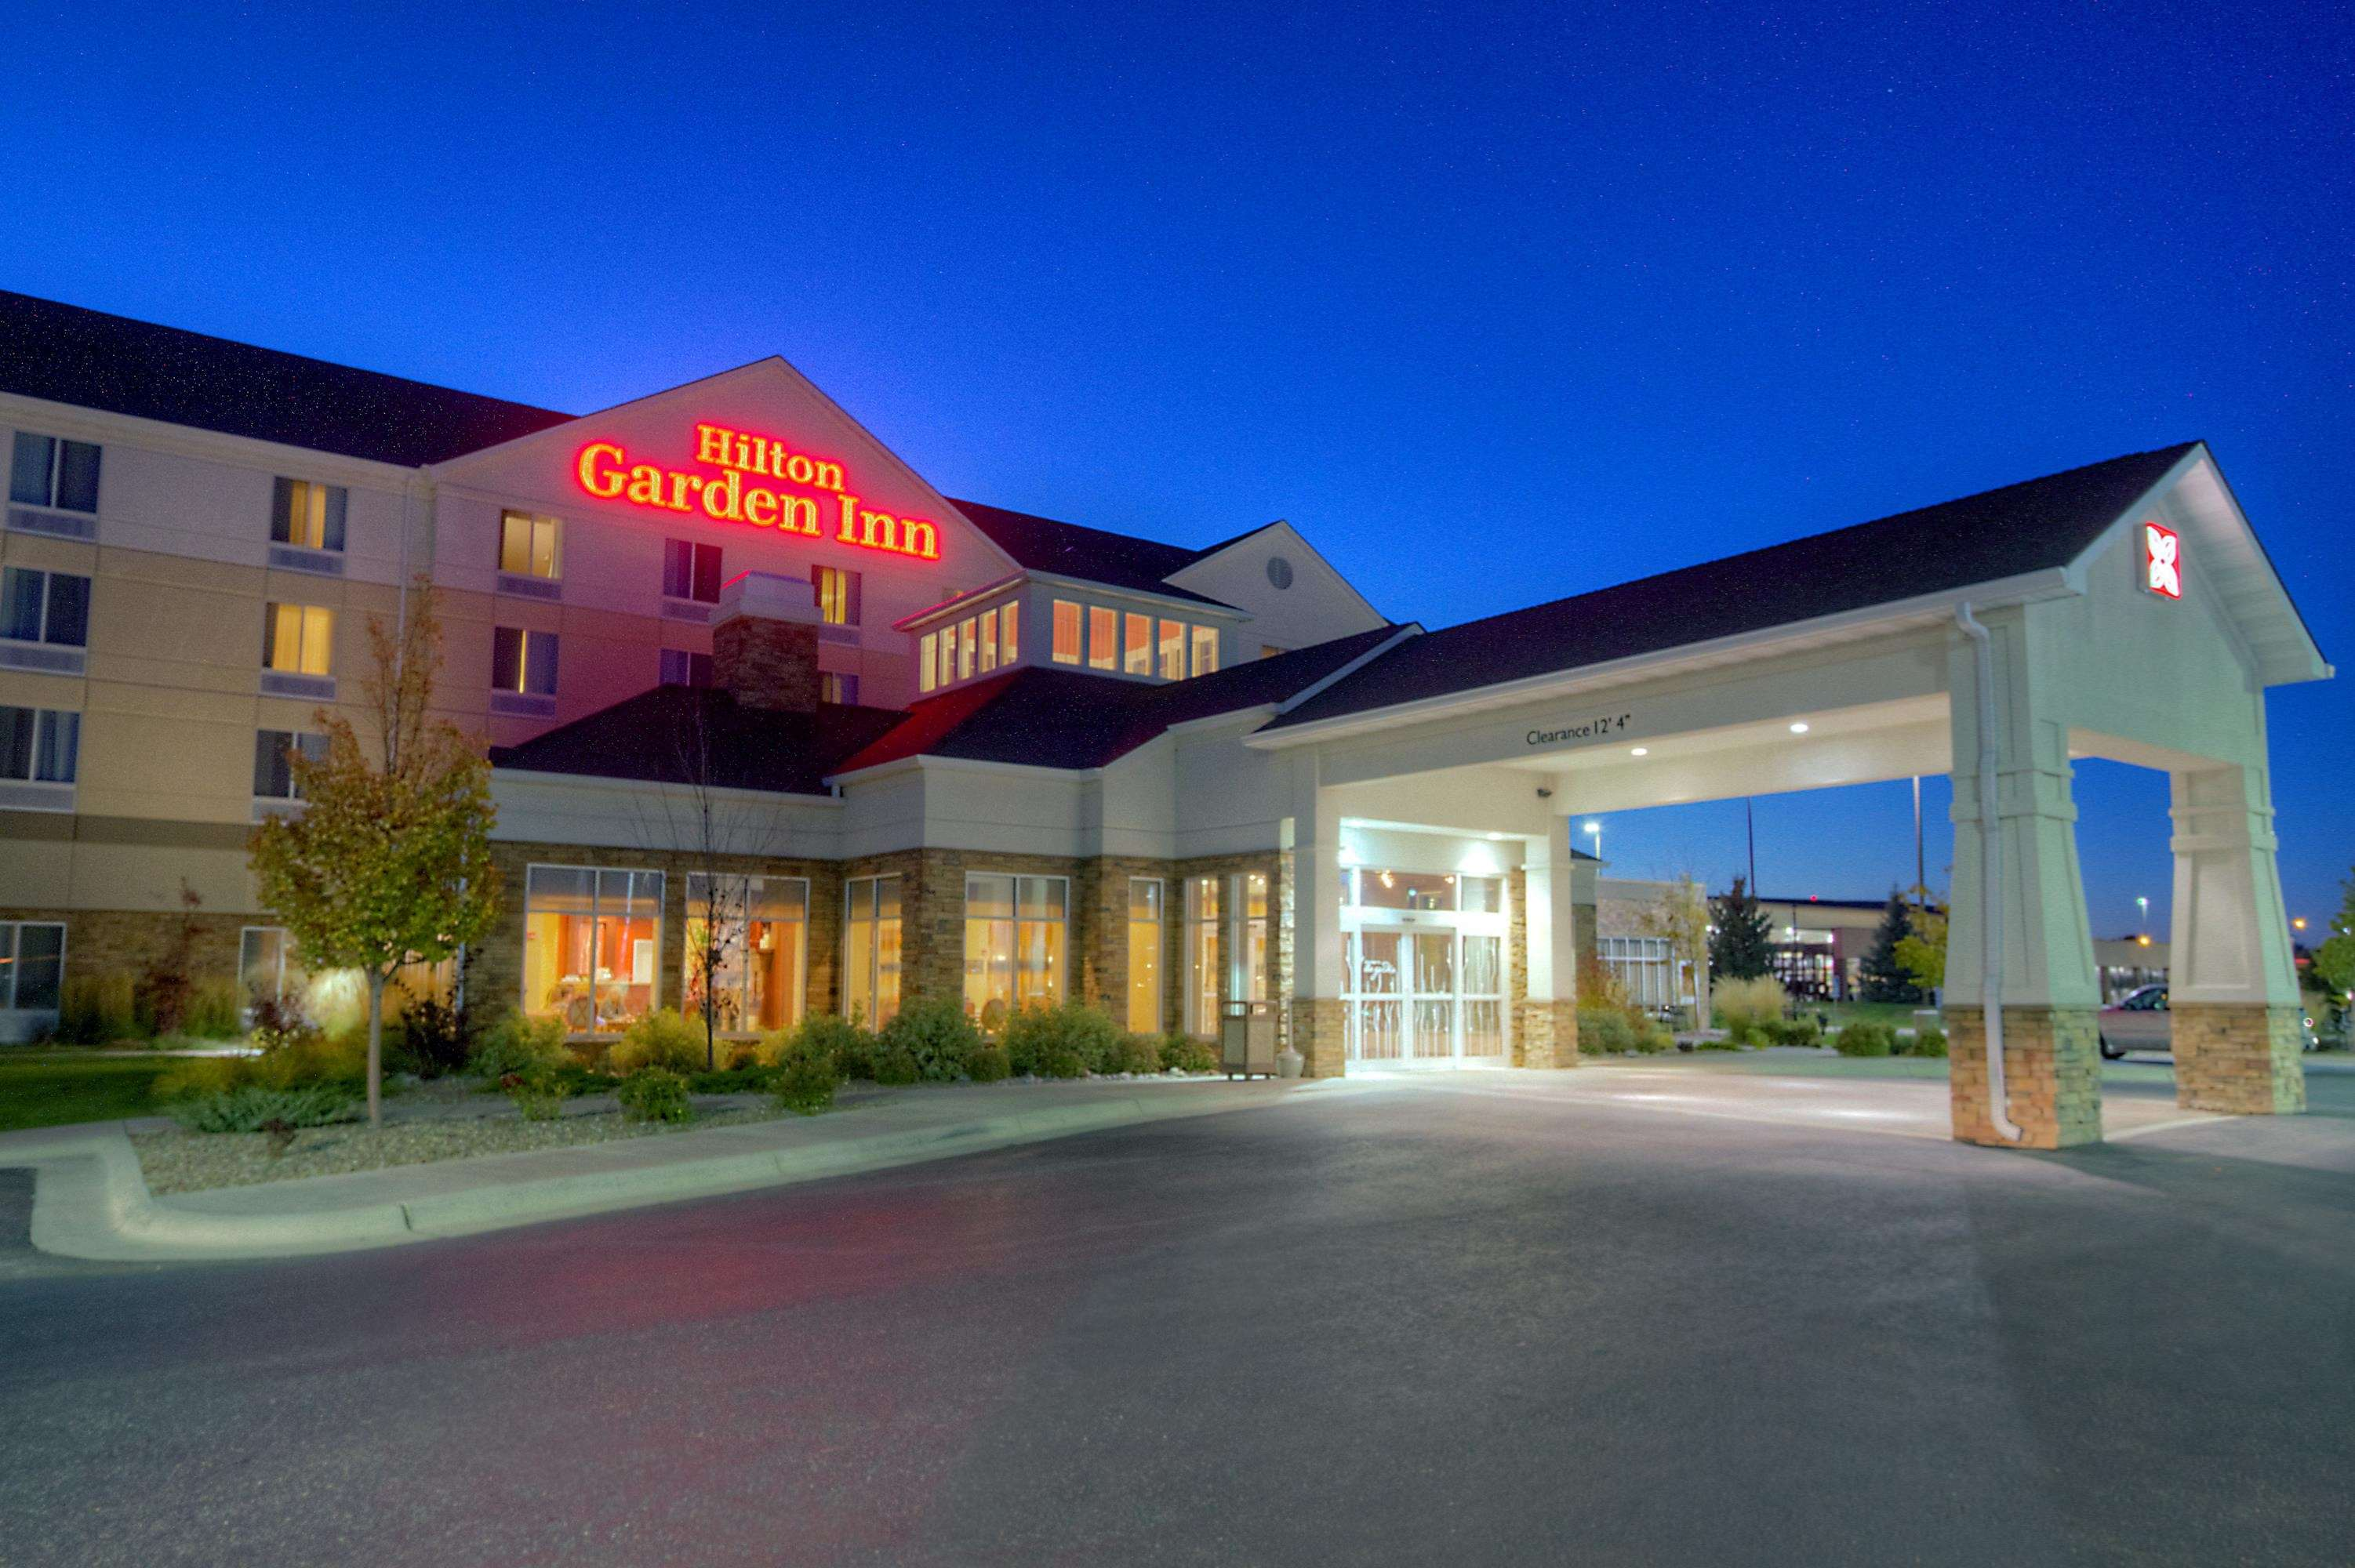 Hilton Garden Inn Great Falls image 0